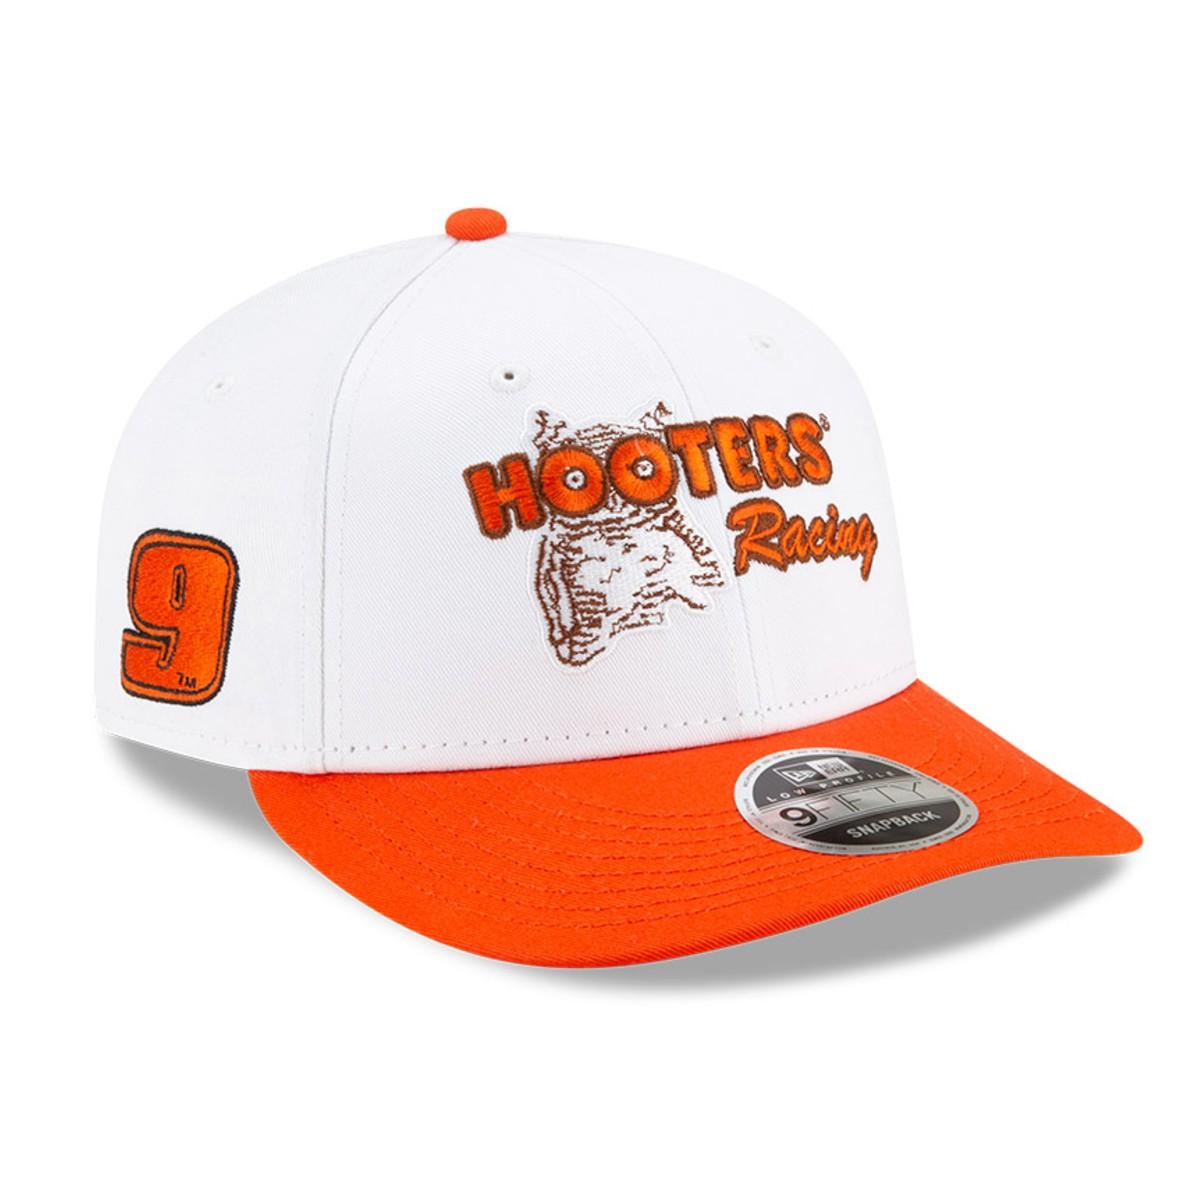 Chase Elliott #9 2021 Race Day  Hooters Snapback Hat